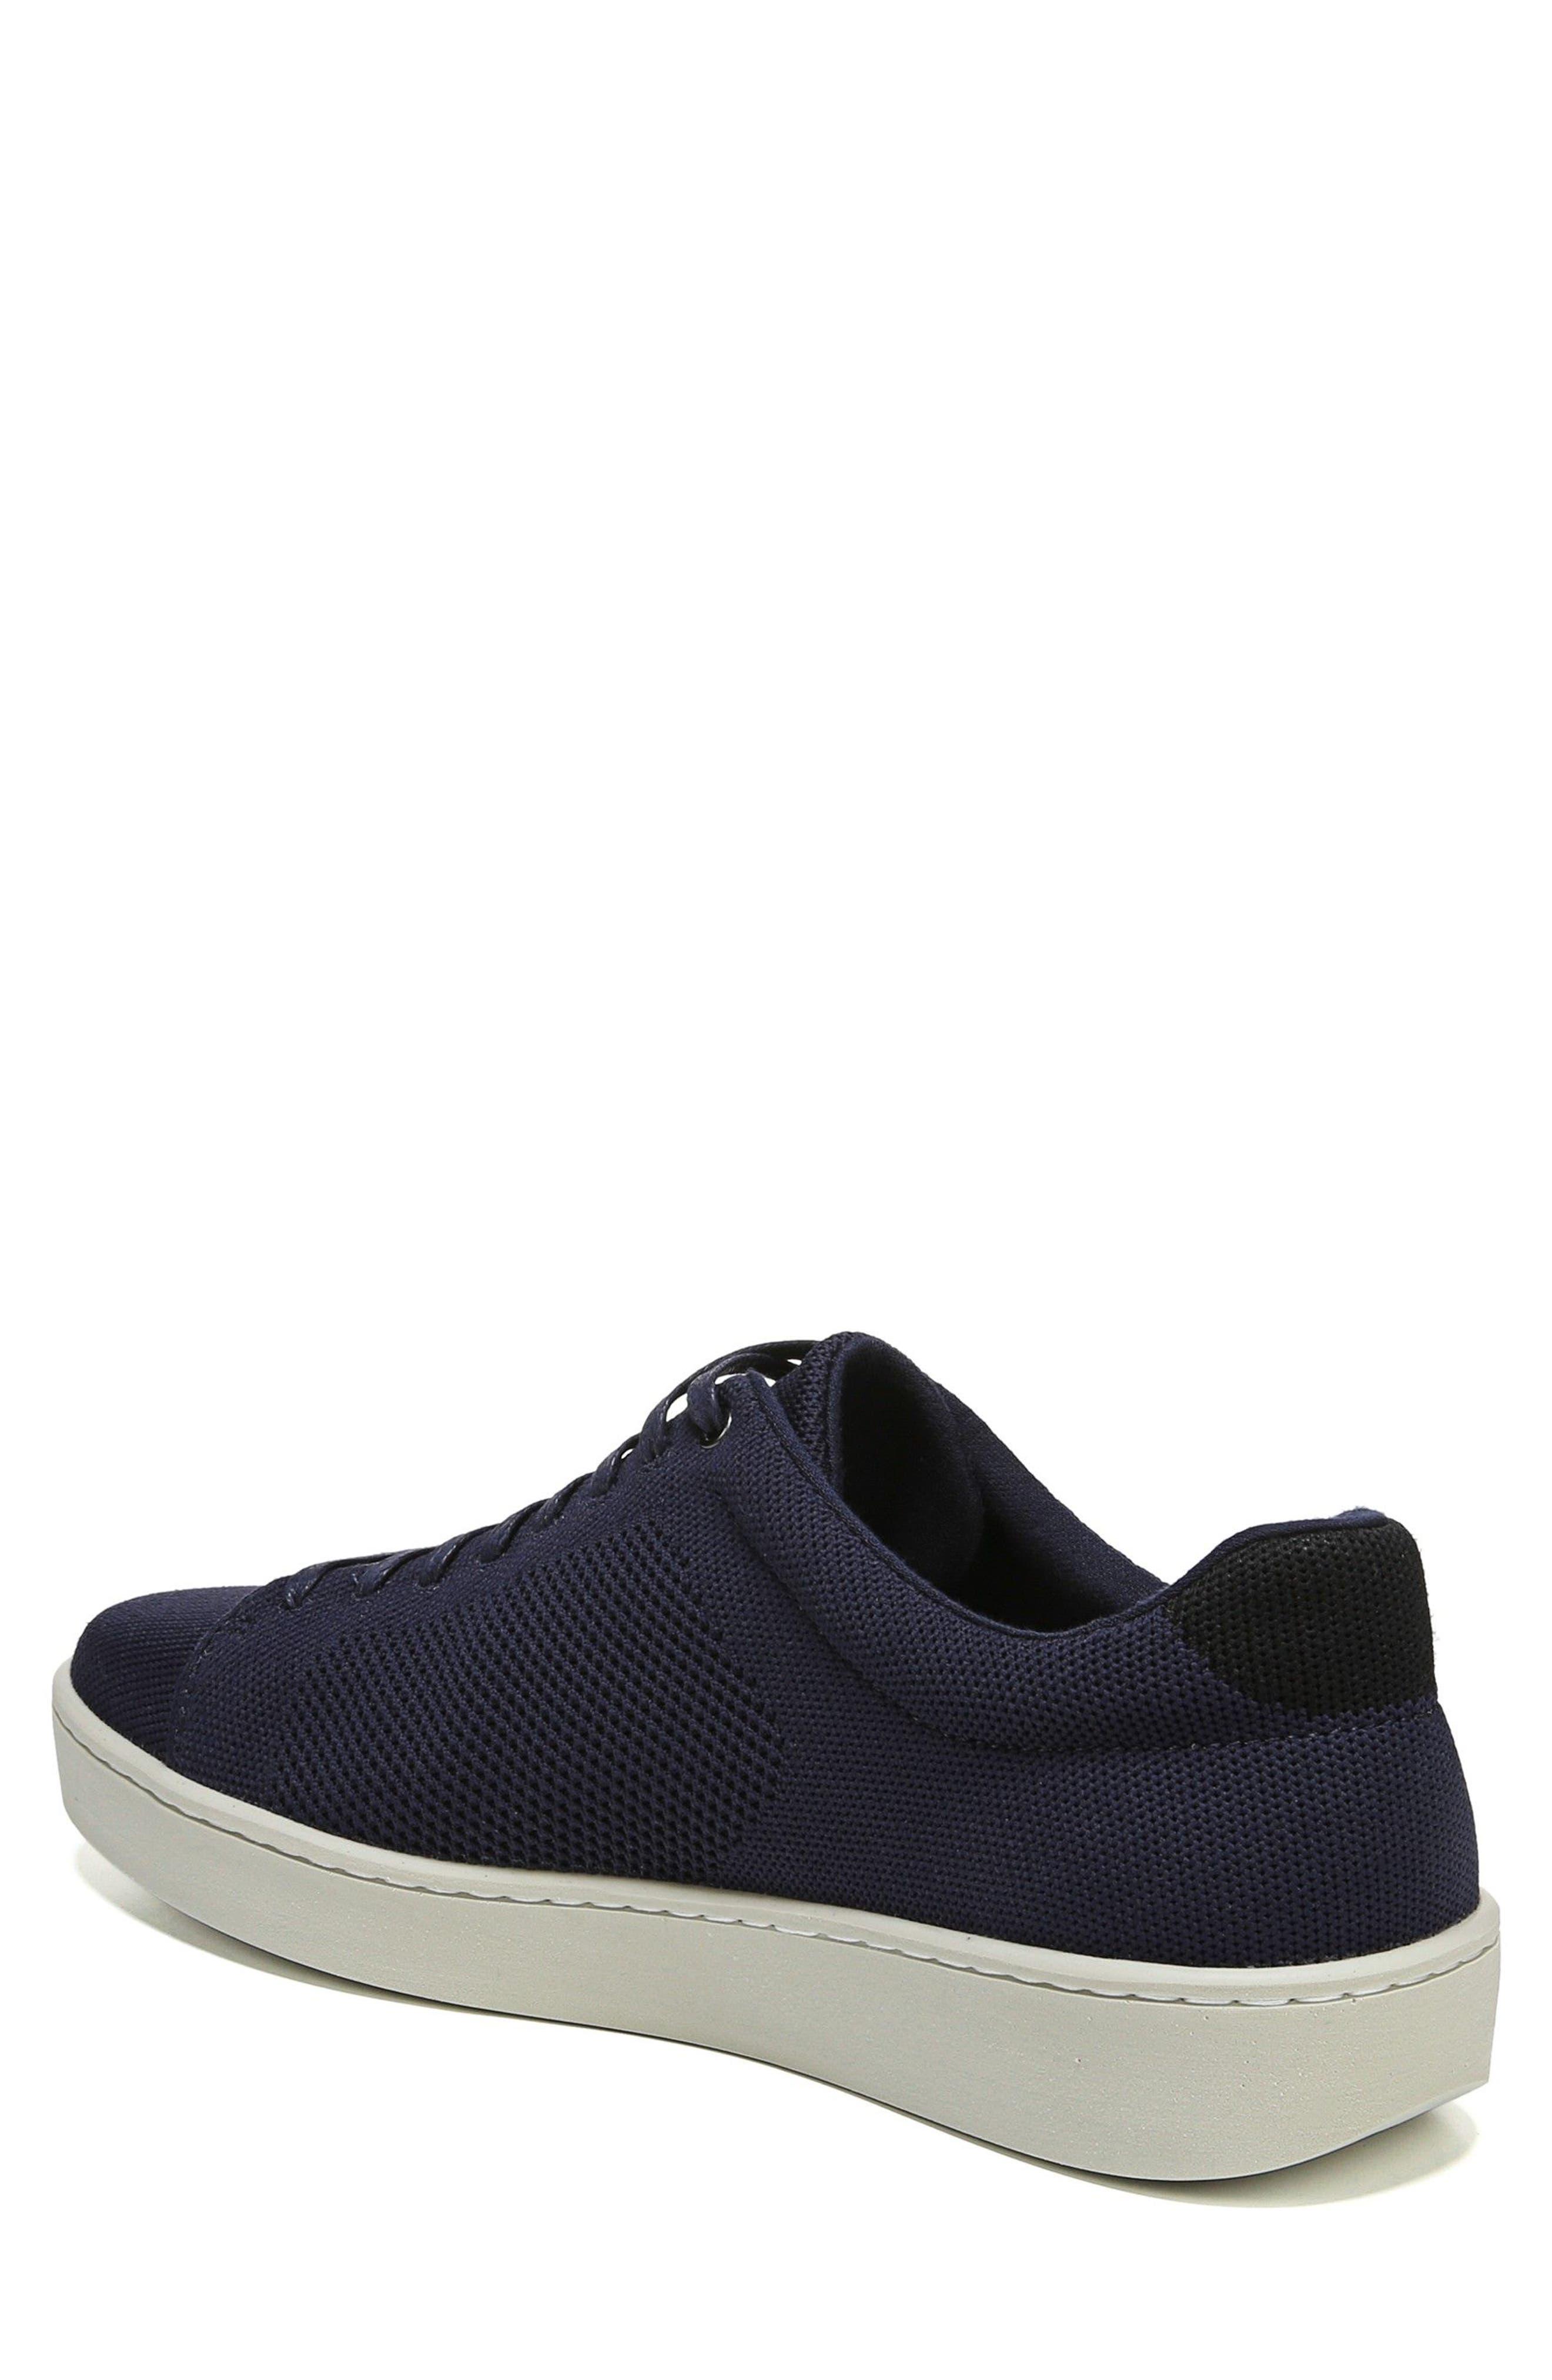 Silos Knit Low Top Sneaker,                             Alternate thumbnail 2, color,                             COASTAL